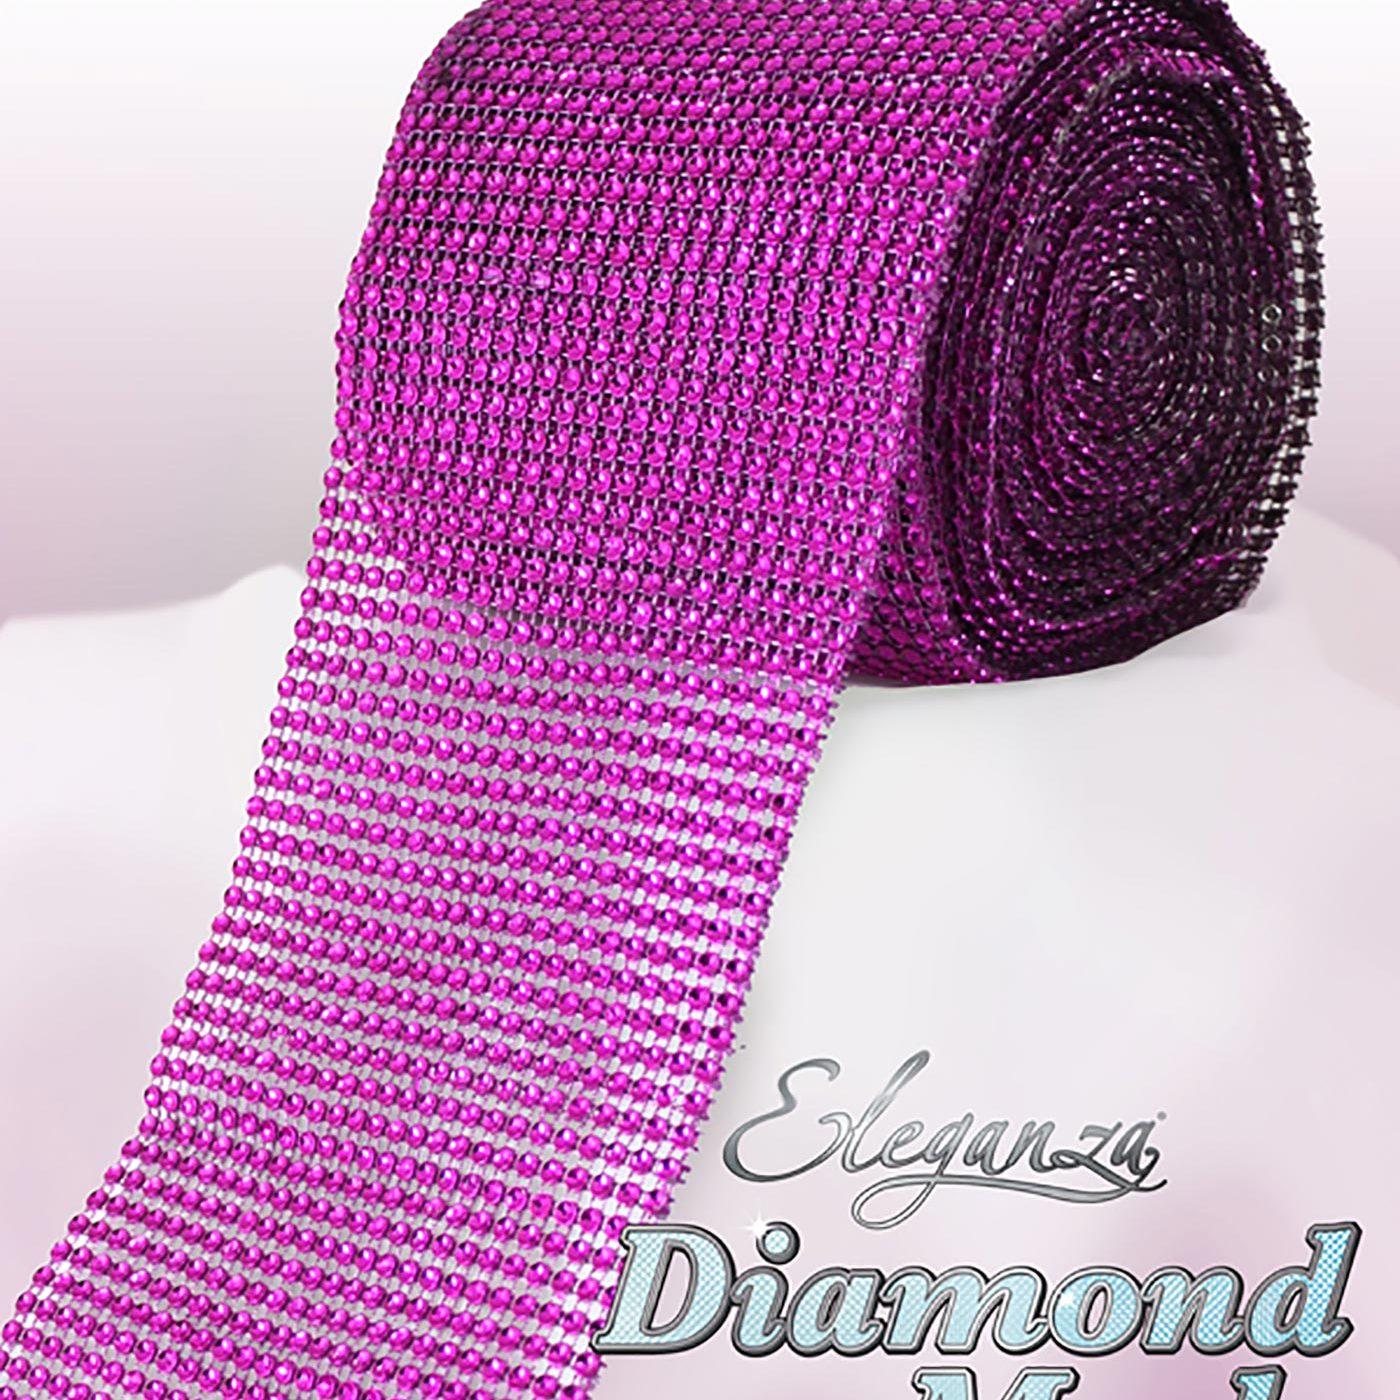 Eleganza Diamond Mesh 12cm x 9m Fuchsia